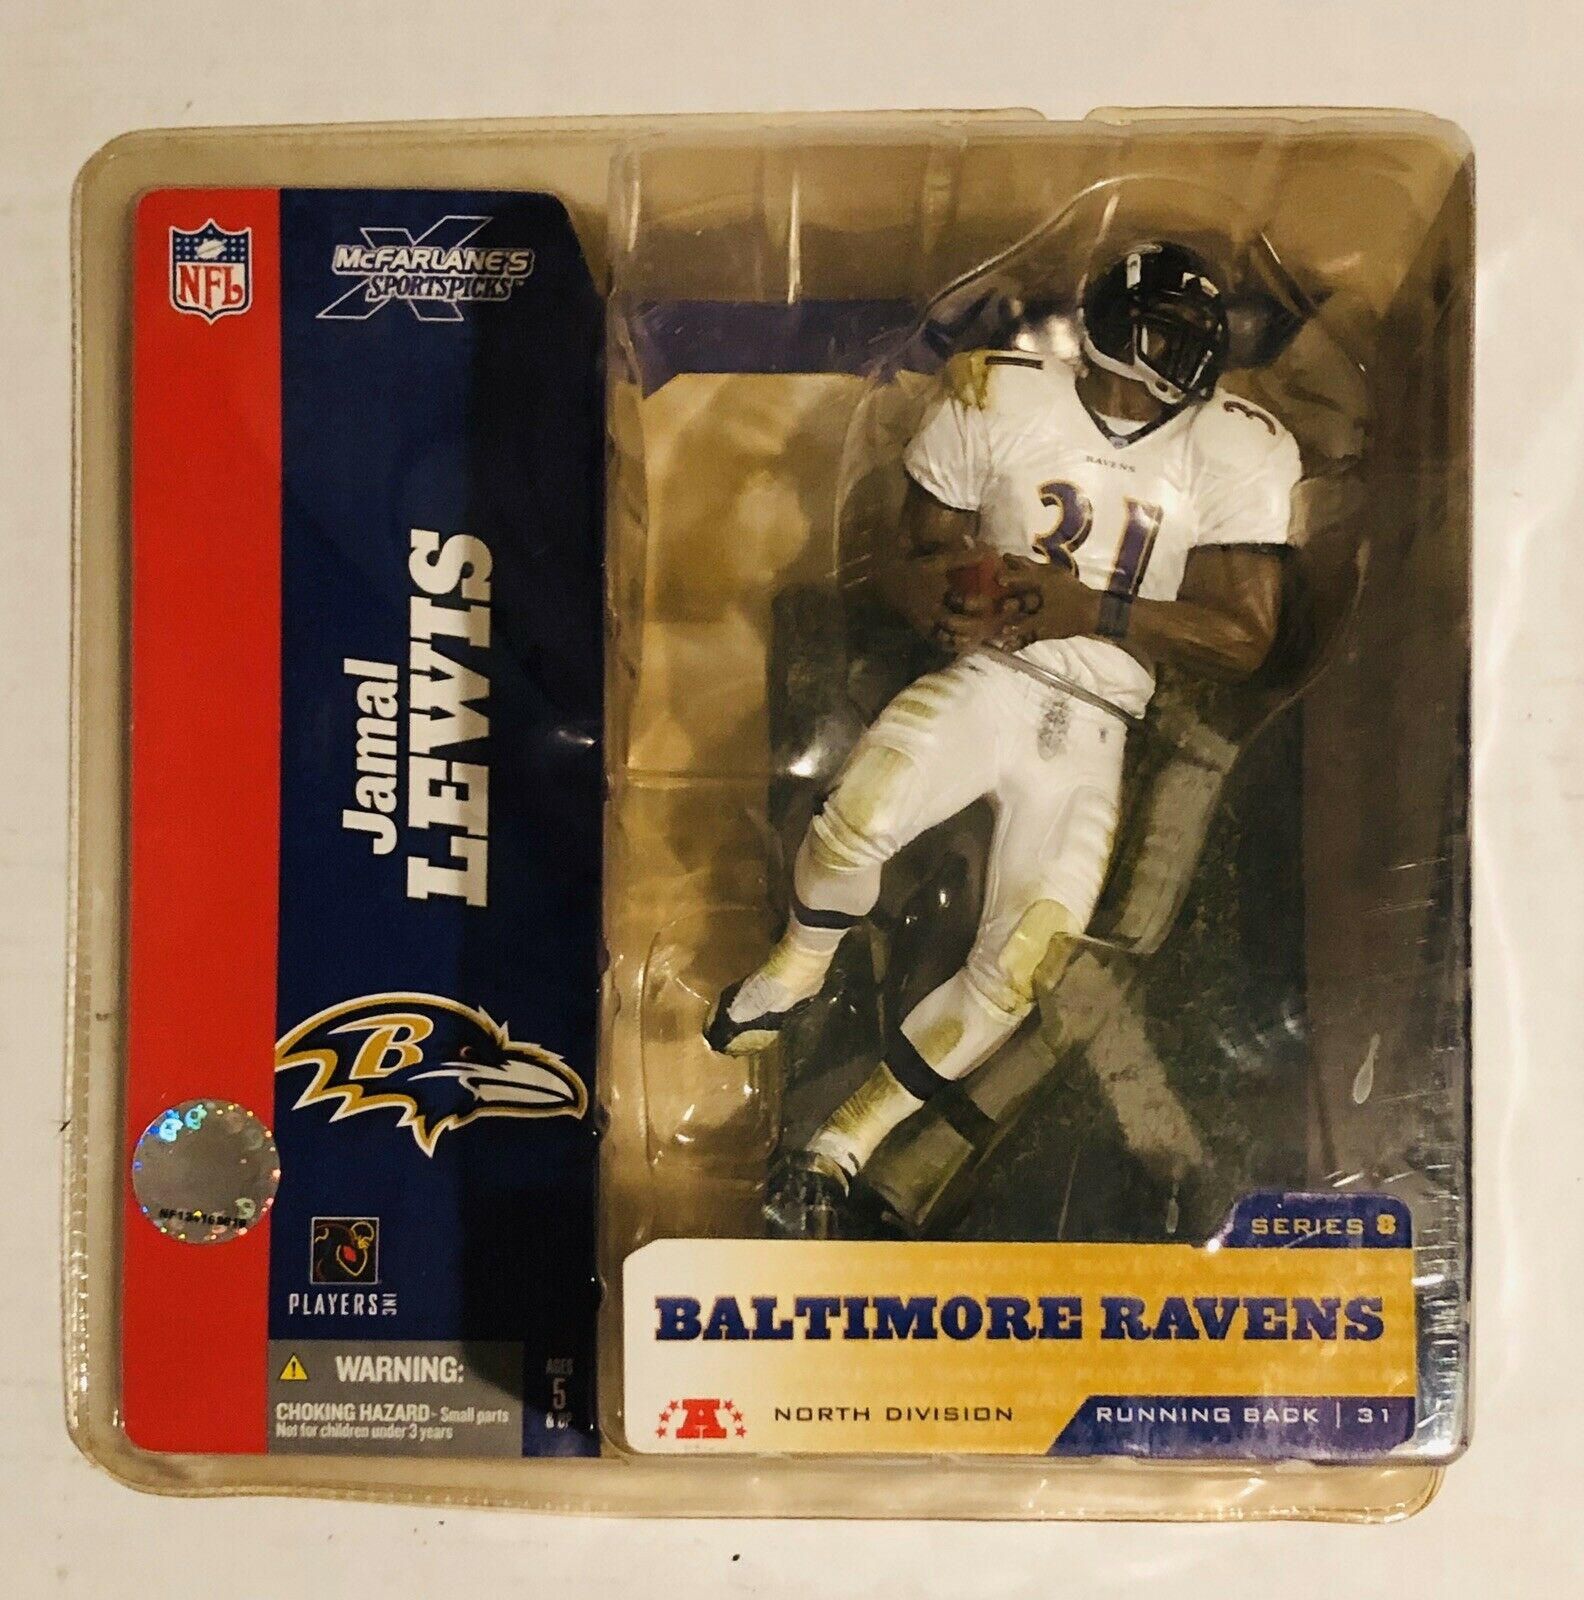 NFL Jamal Lewis Baltimore Ravens McFarlane/'s Sportspicks Figure 2004 Series 8